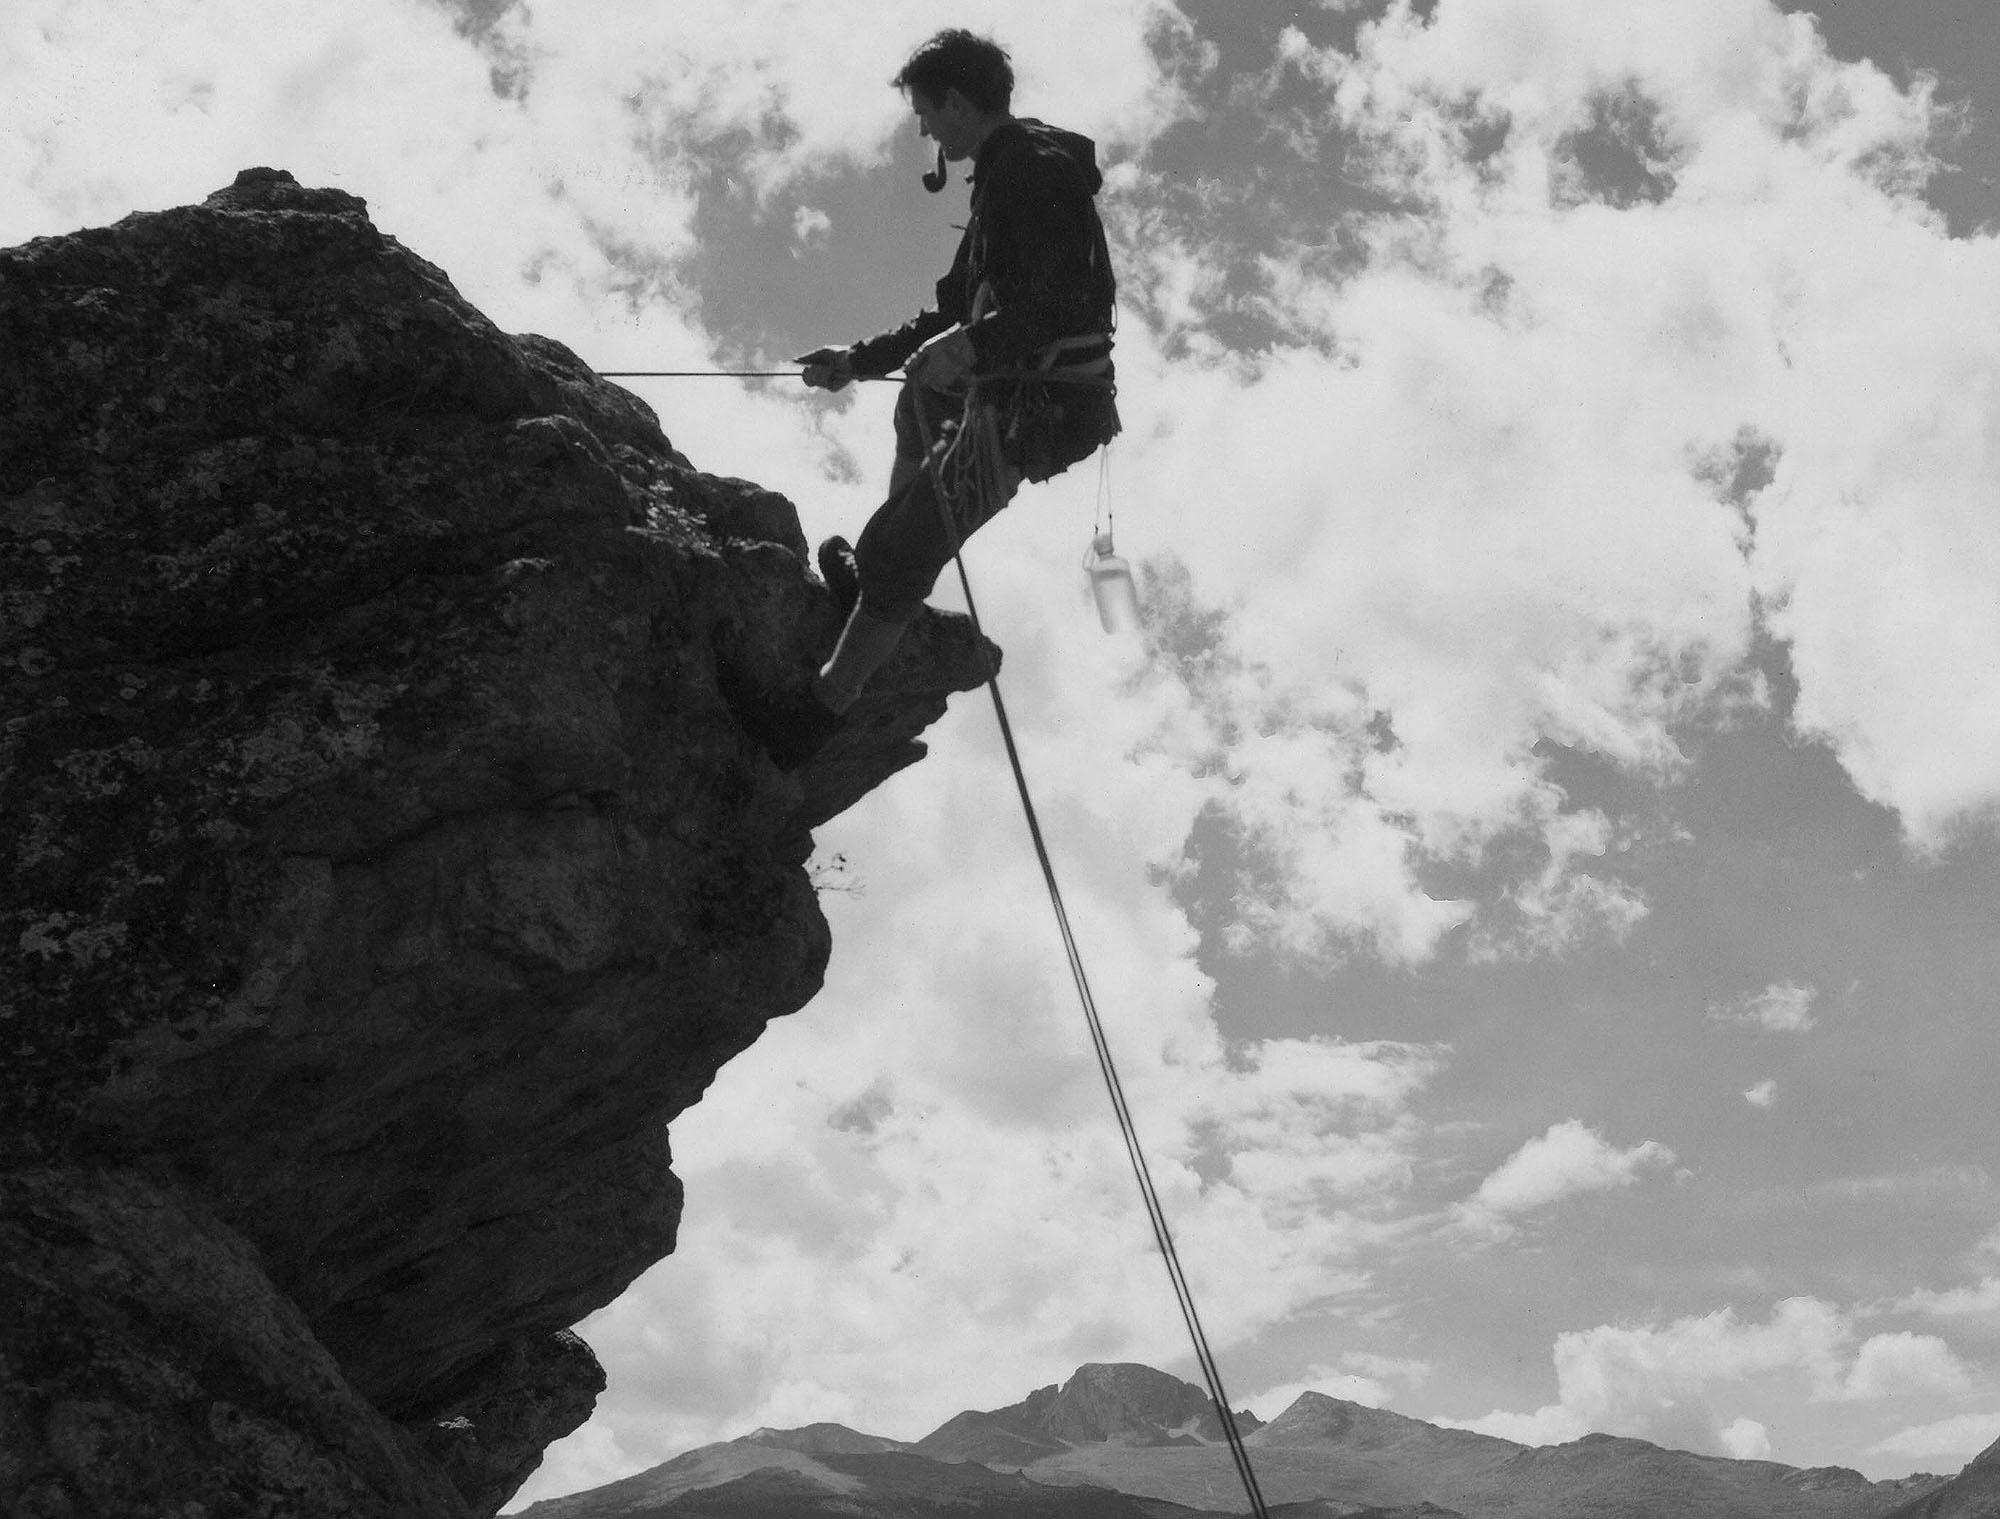 Photo: Rocky Mountain National Park archive climber